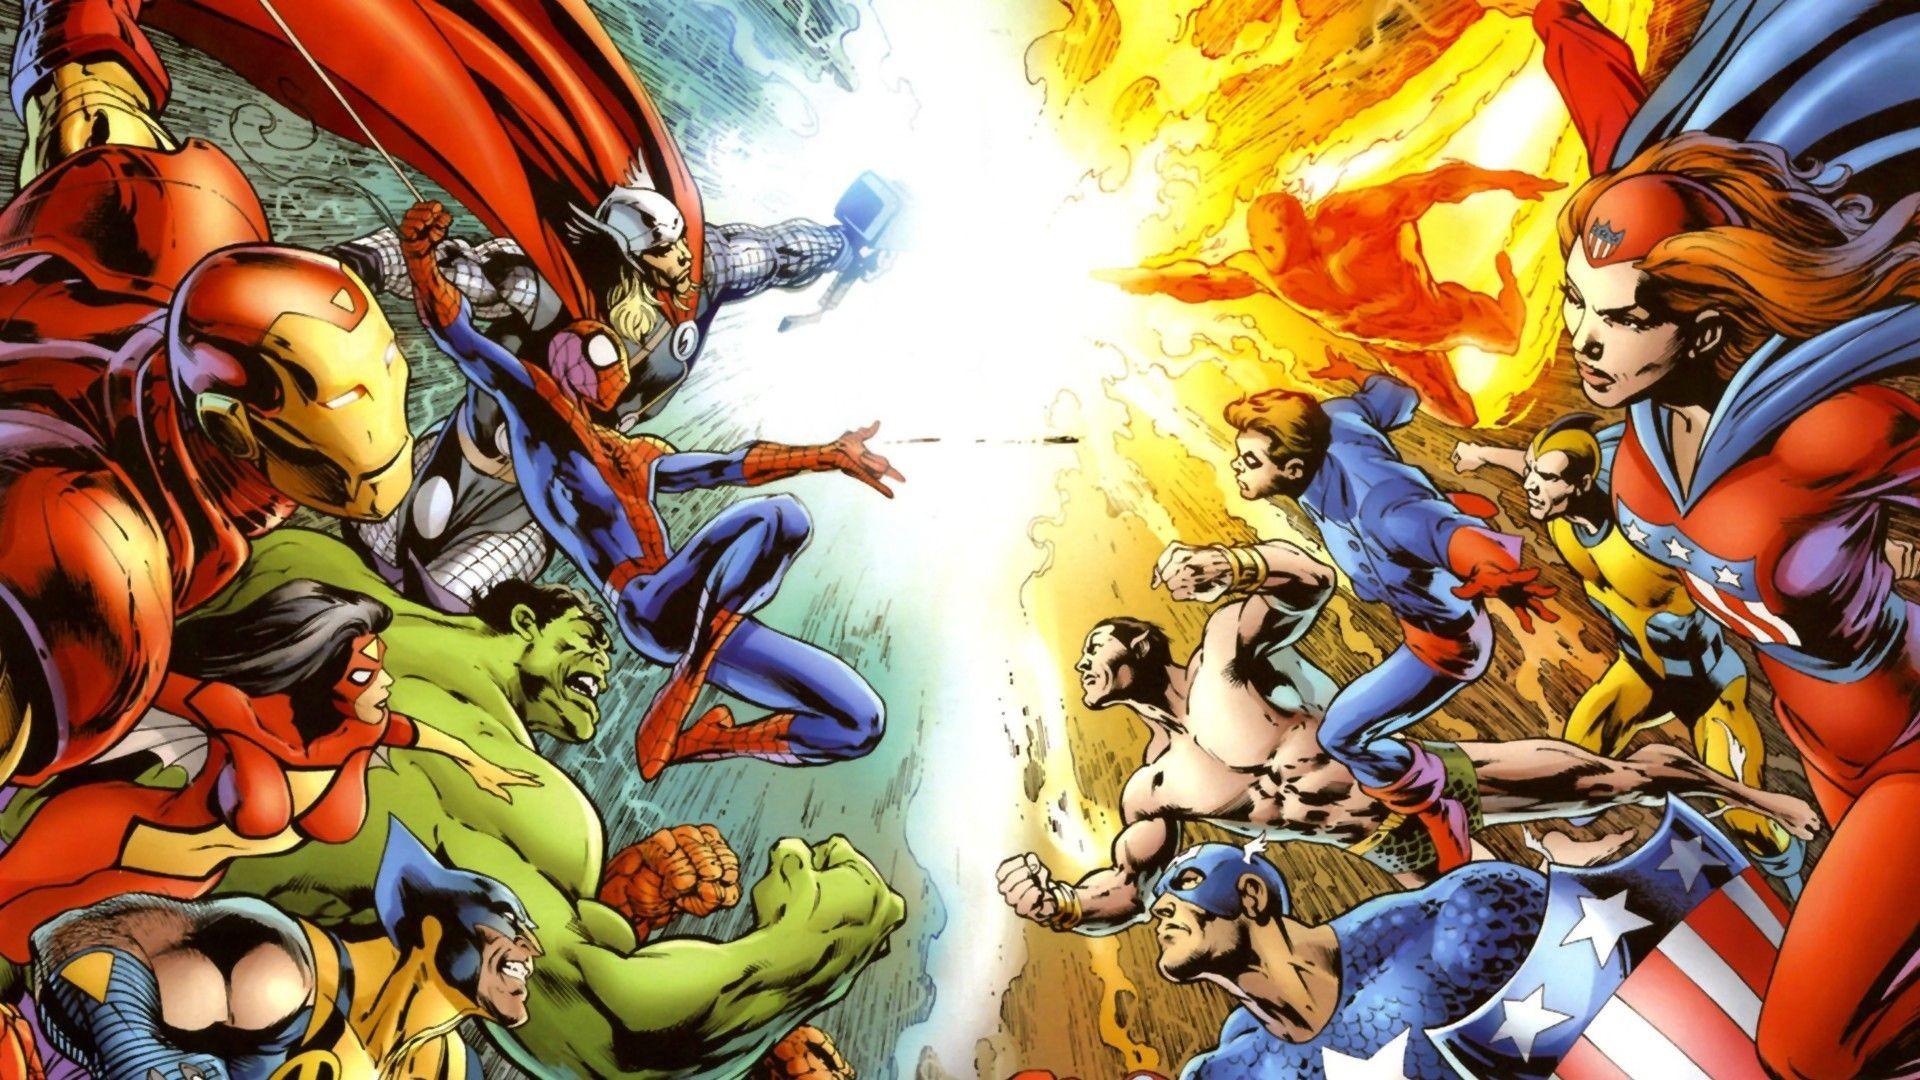 Sexy Superhero Wallpaper × Superhero Wallpaper